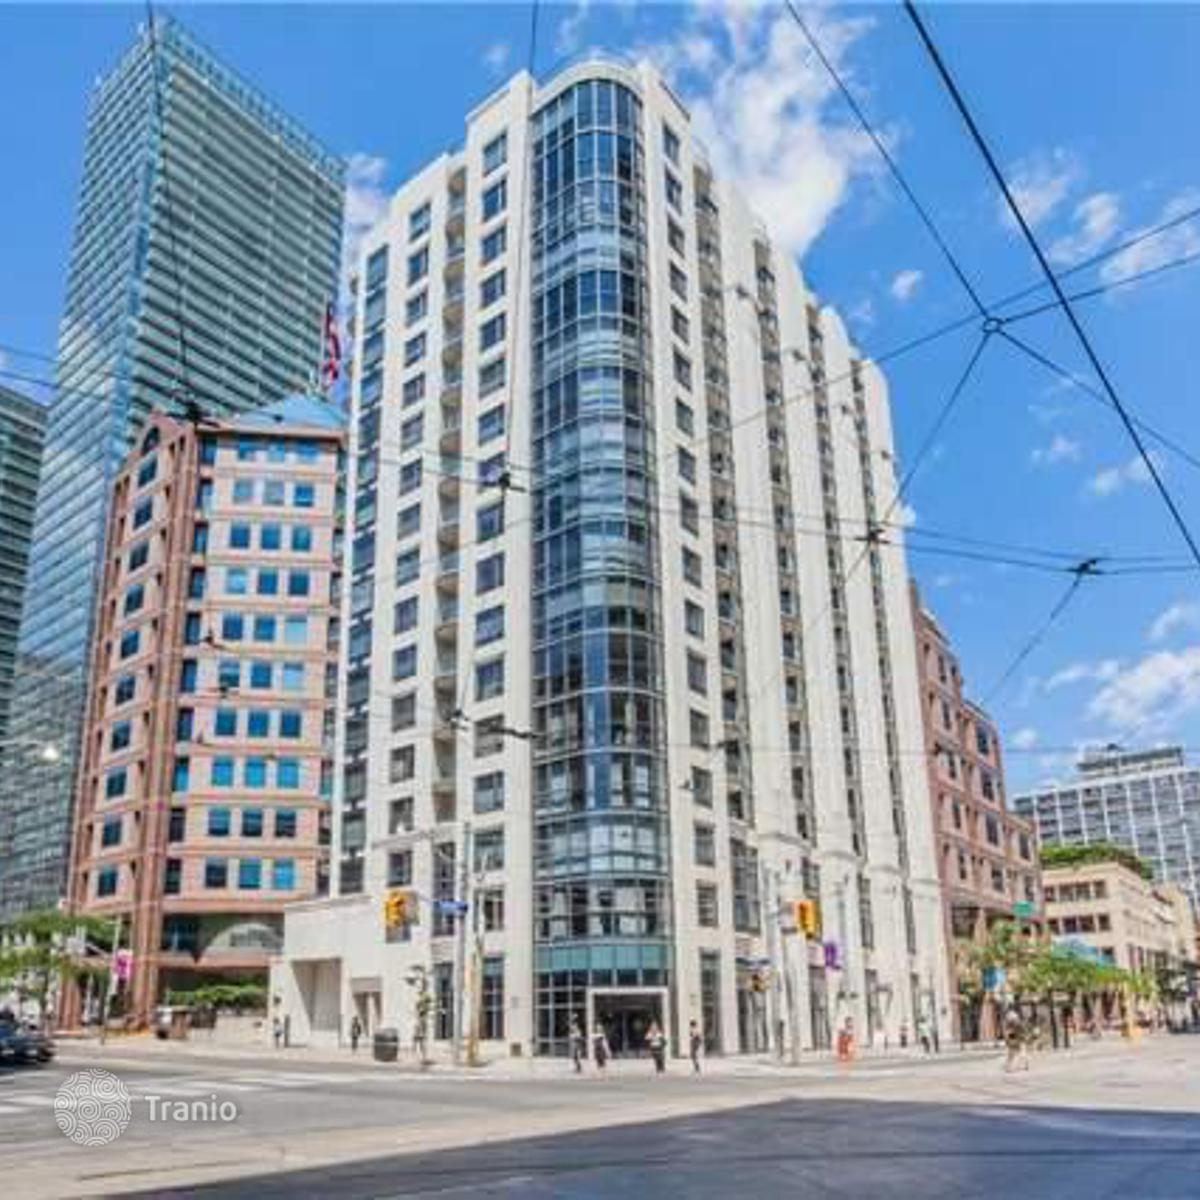 Canadian Apartments: Listing #1437458 In Toronto, Ontario, Canada